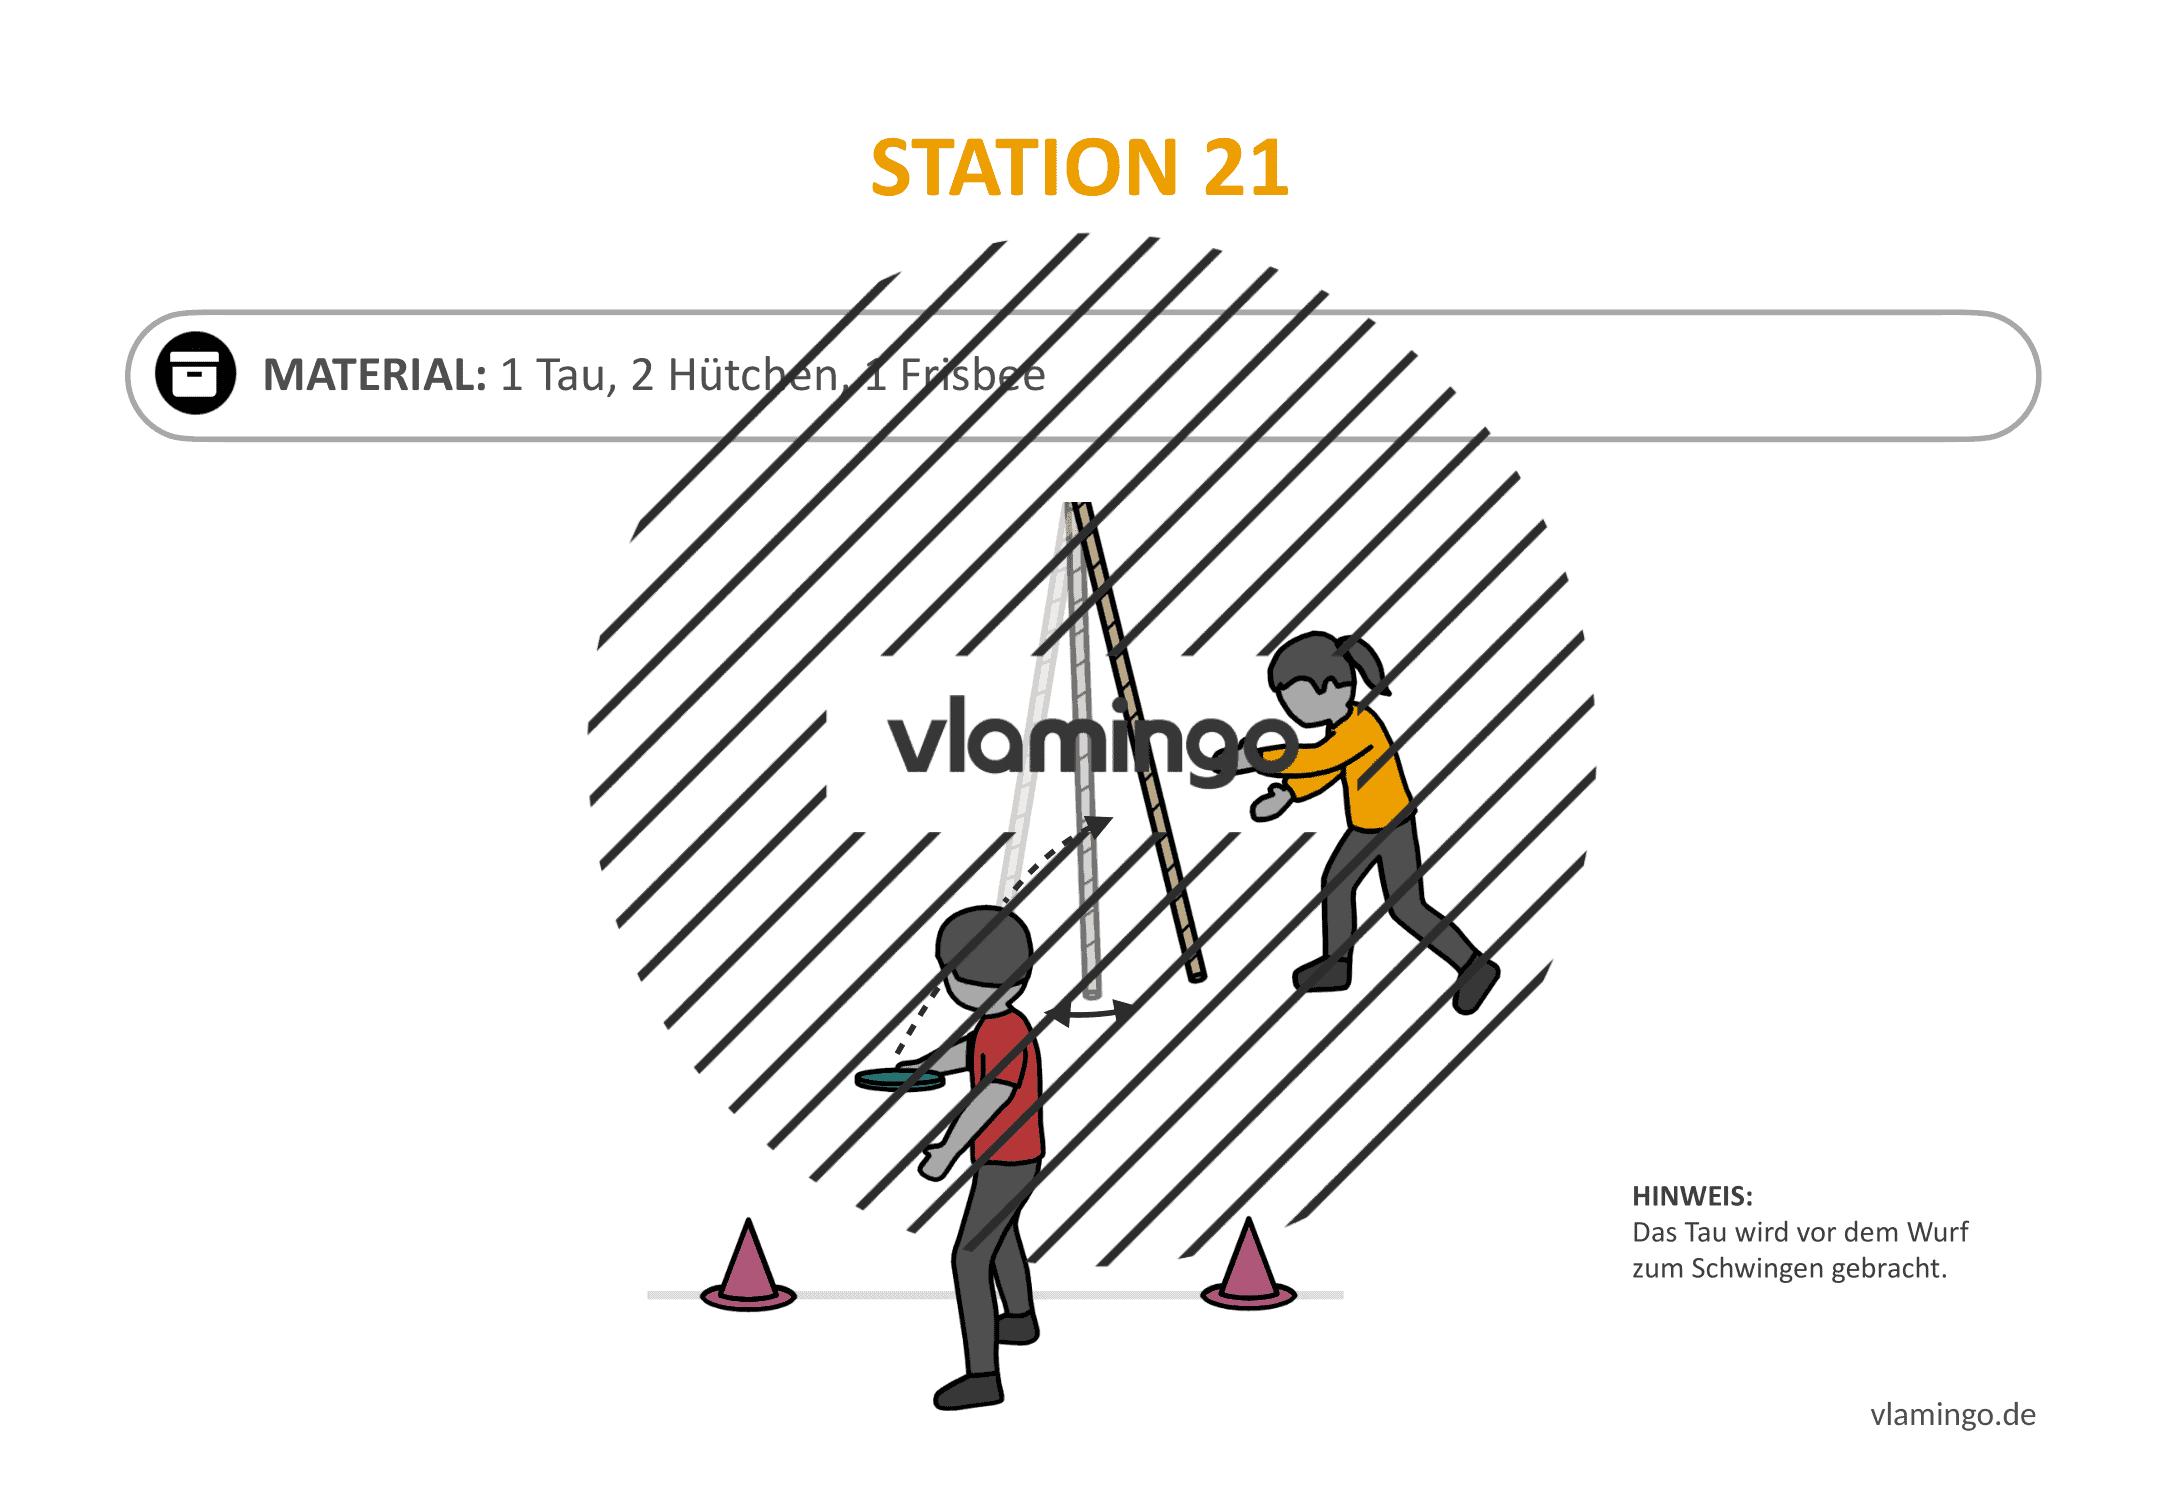 Frisbeegolf (Disc-Golf) - Station 21